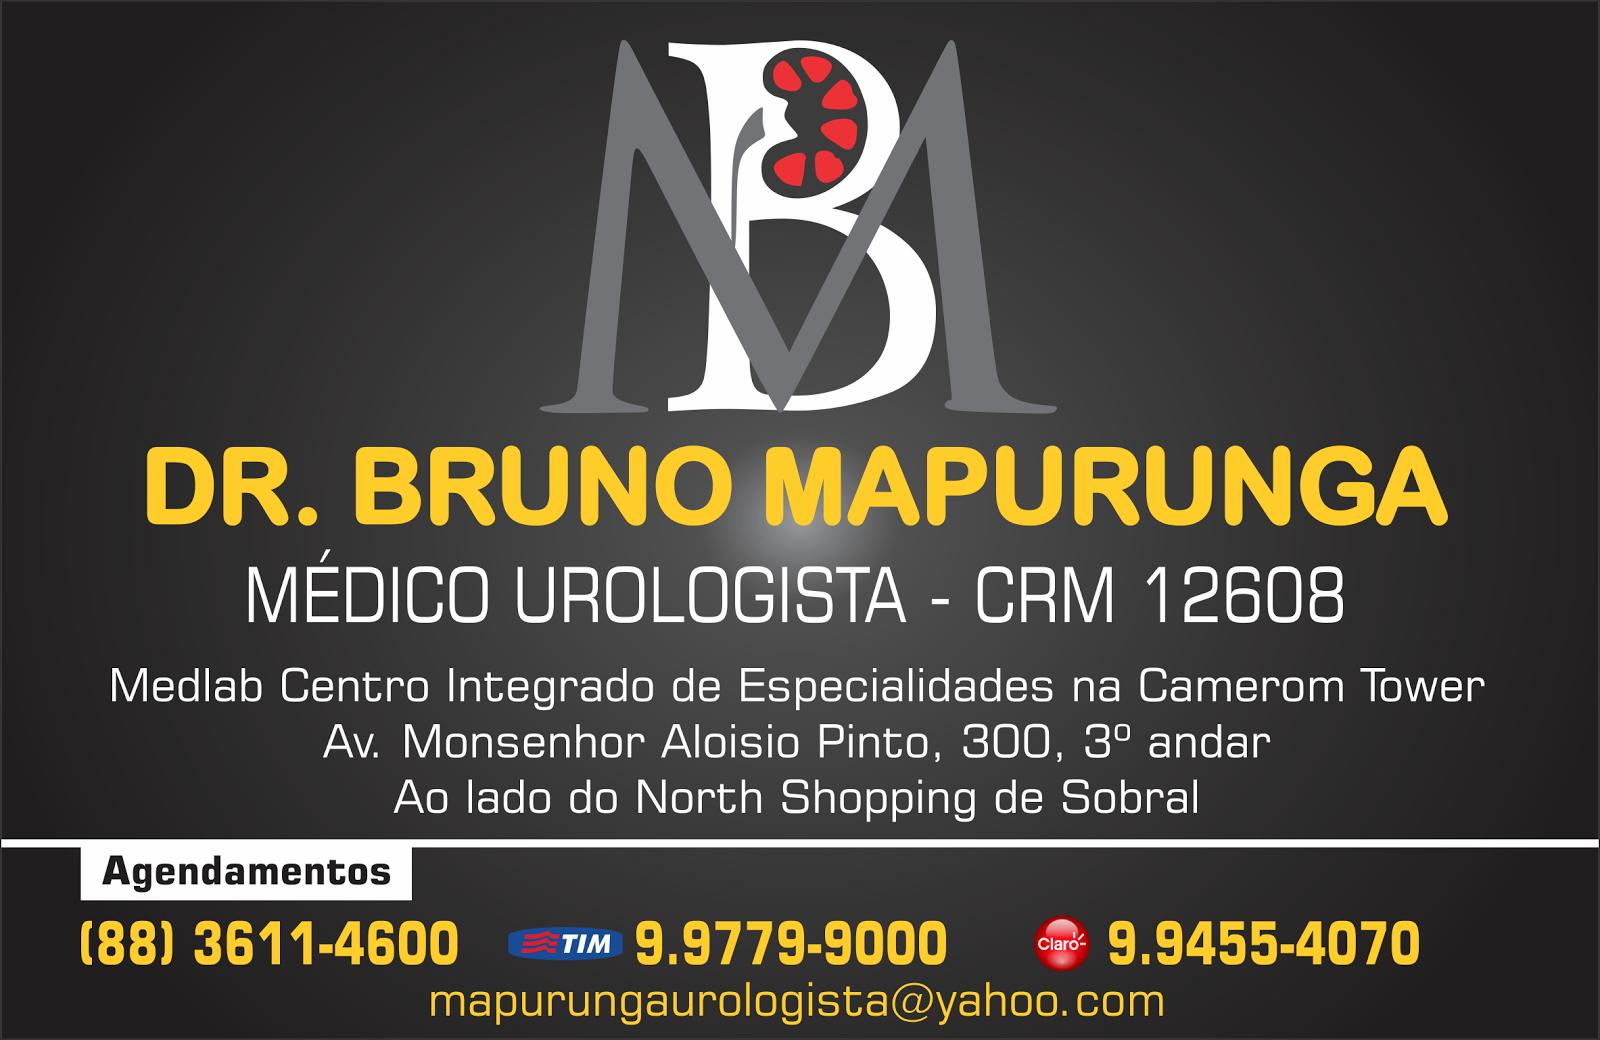 DR. BRUNO MAPURUNGA